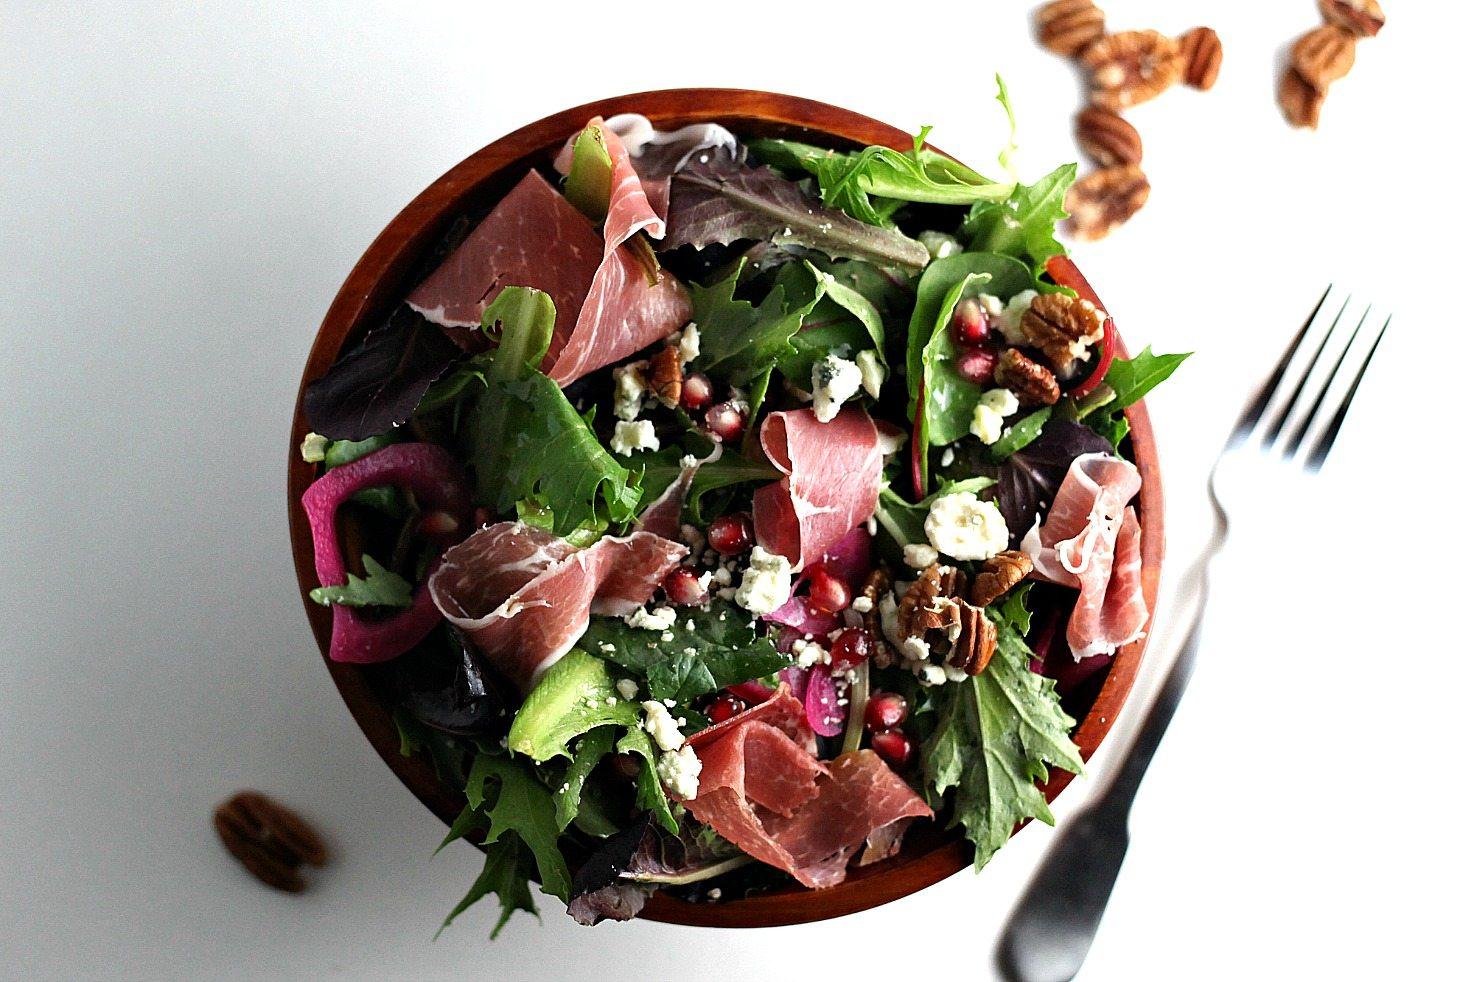 Prosciutto Salad and a Rosemary Vinaigrette